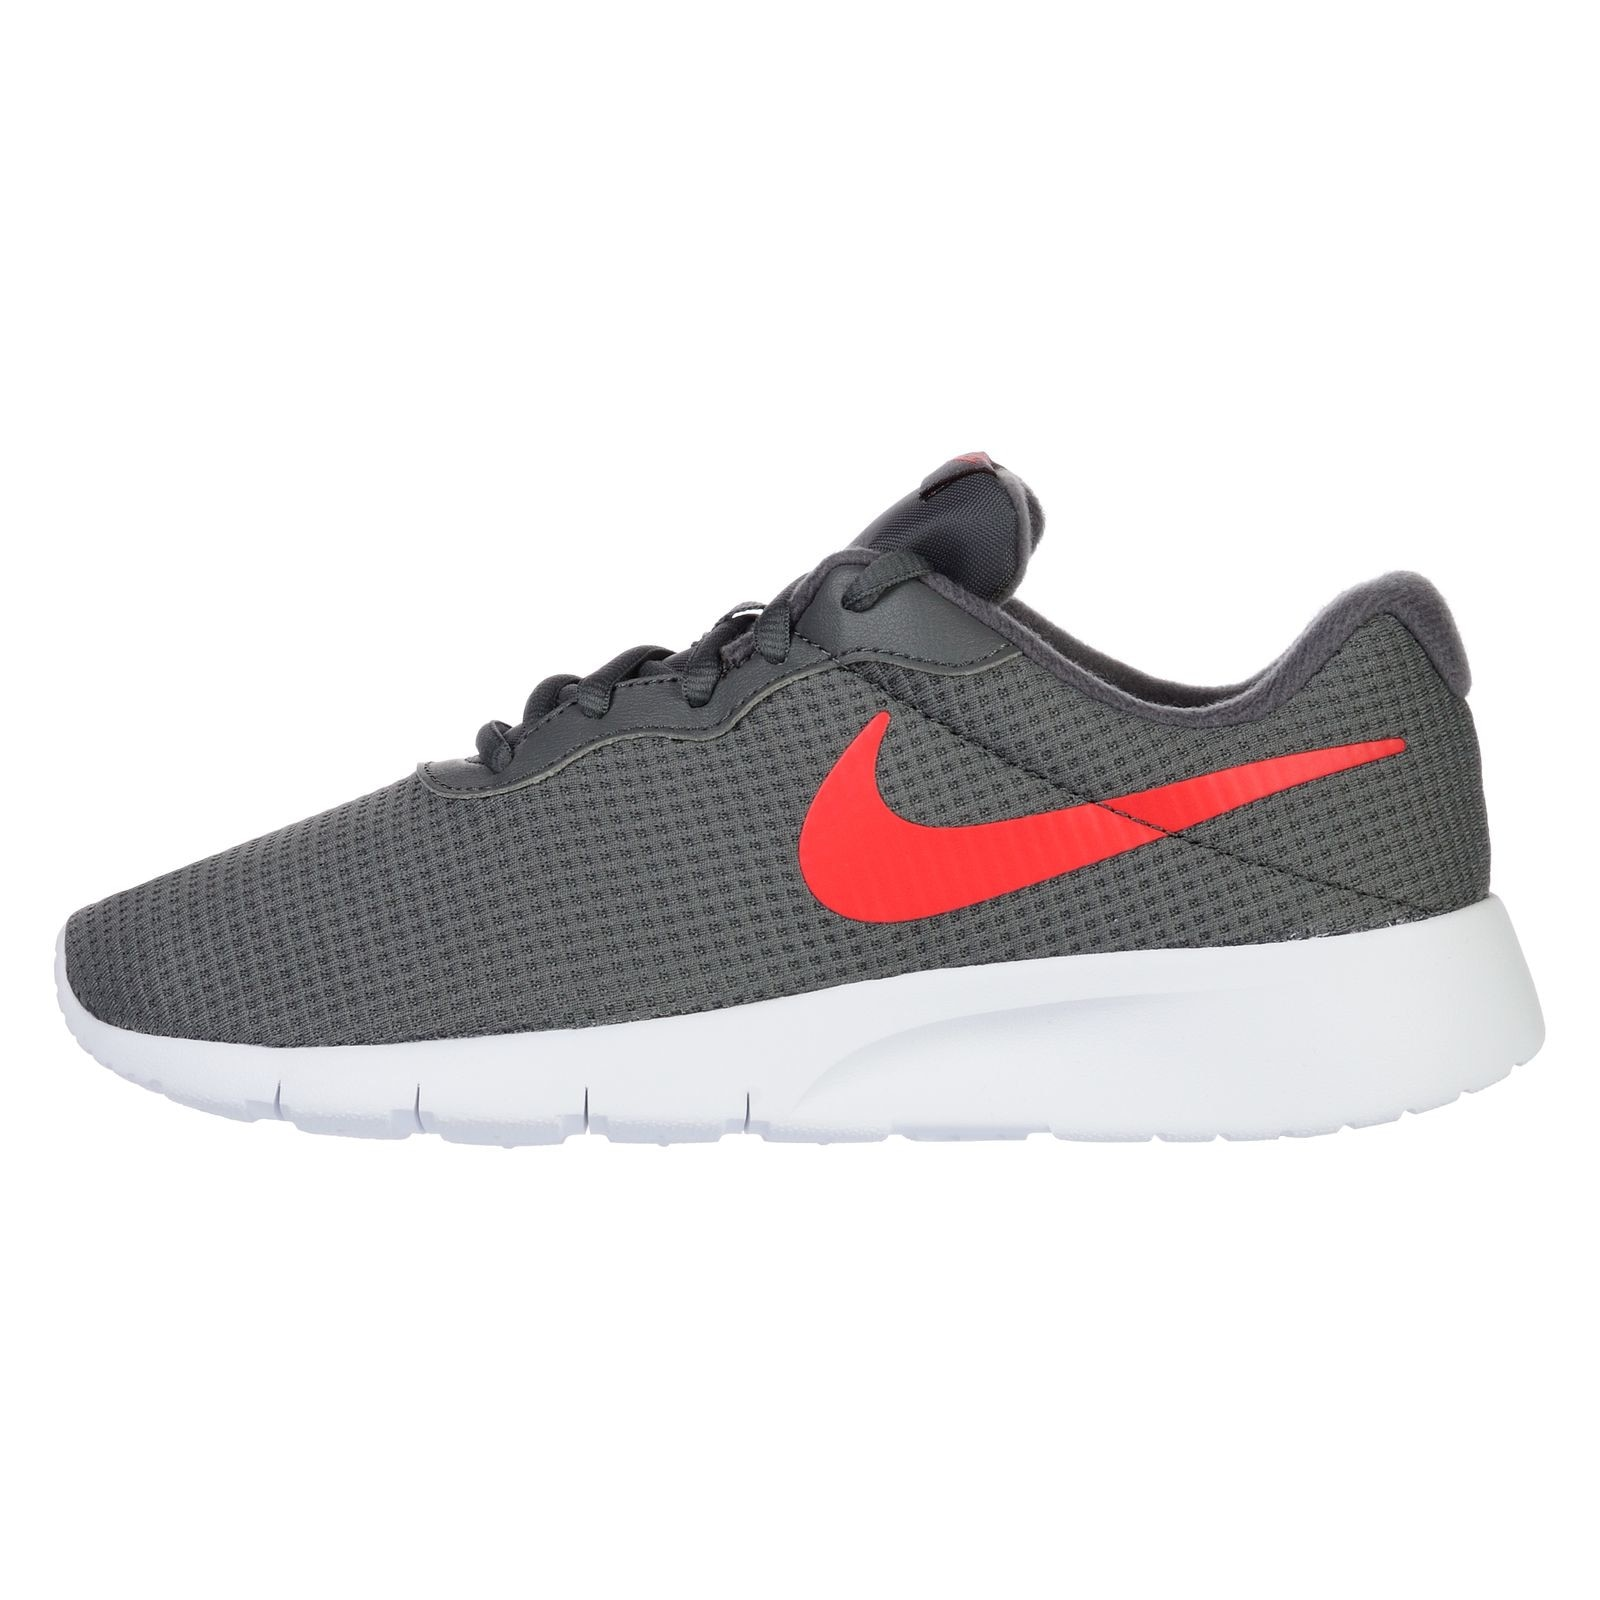 Pantofi sport Nike Nike Tanjun (gs) 818381020 Copii Gri 36.5